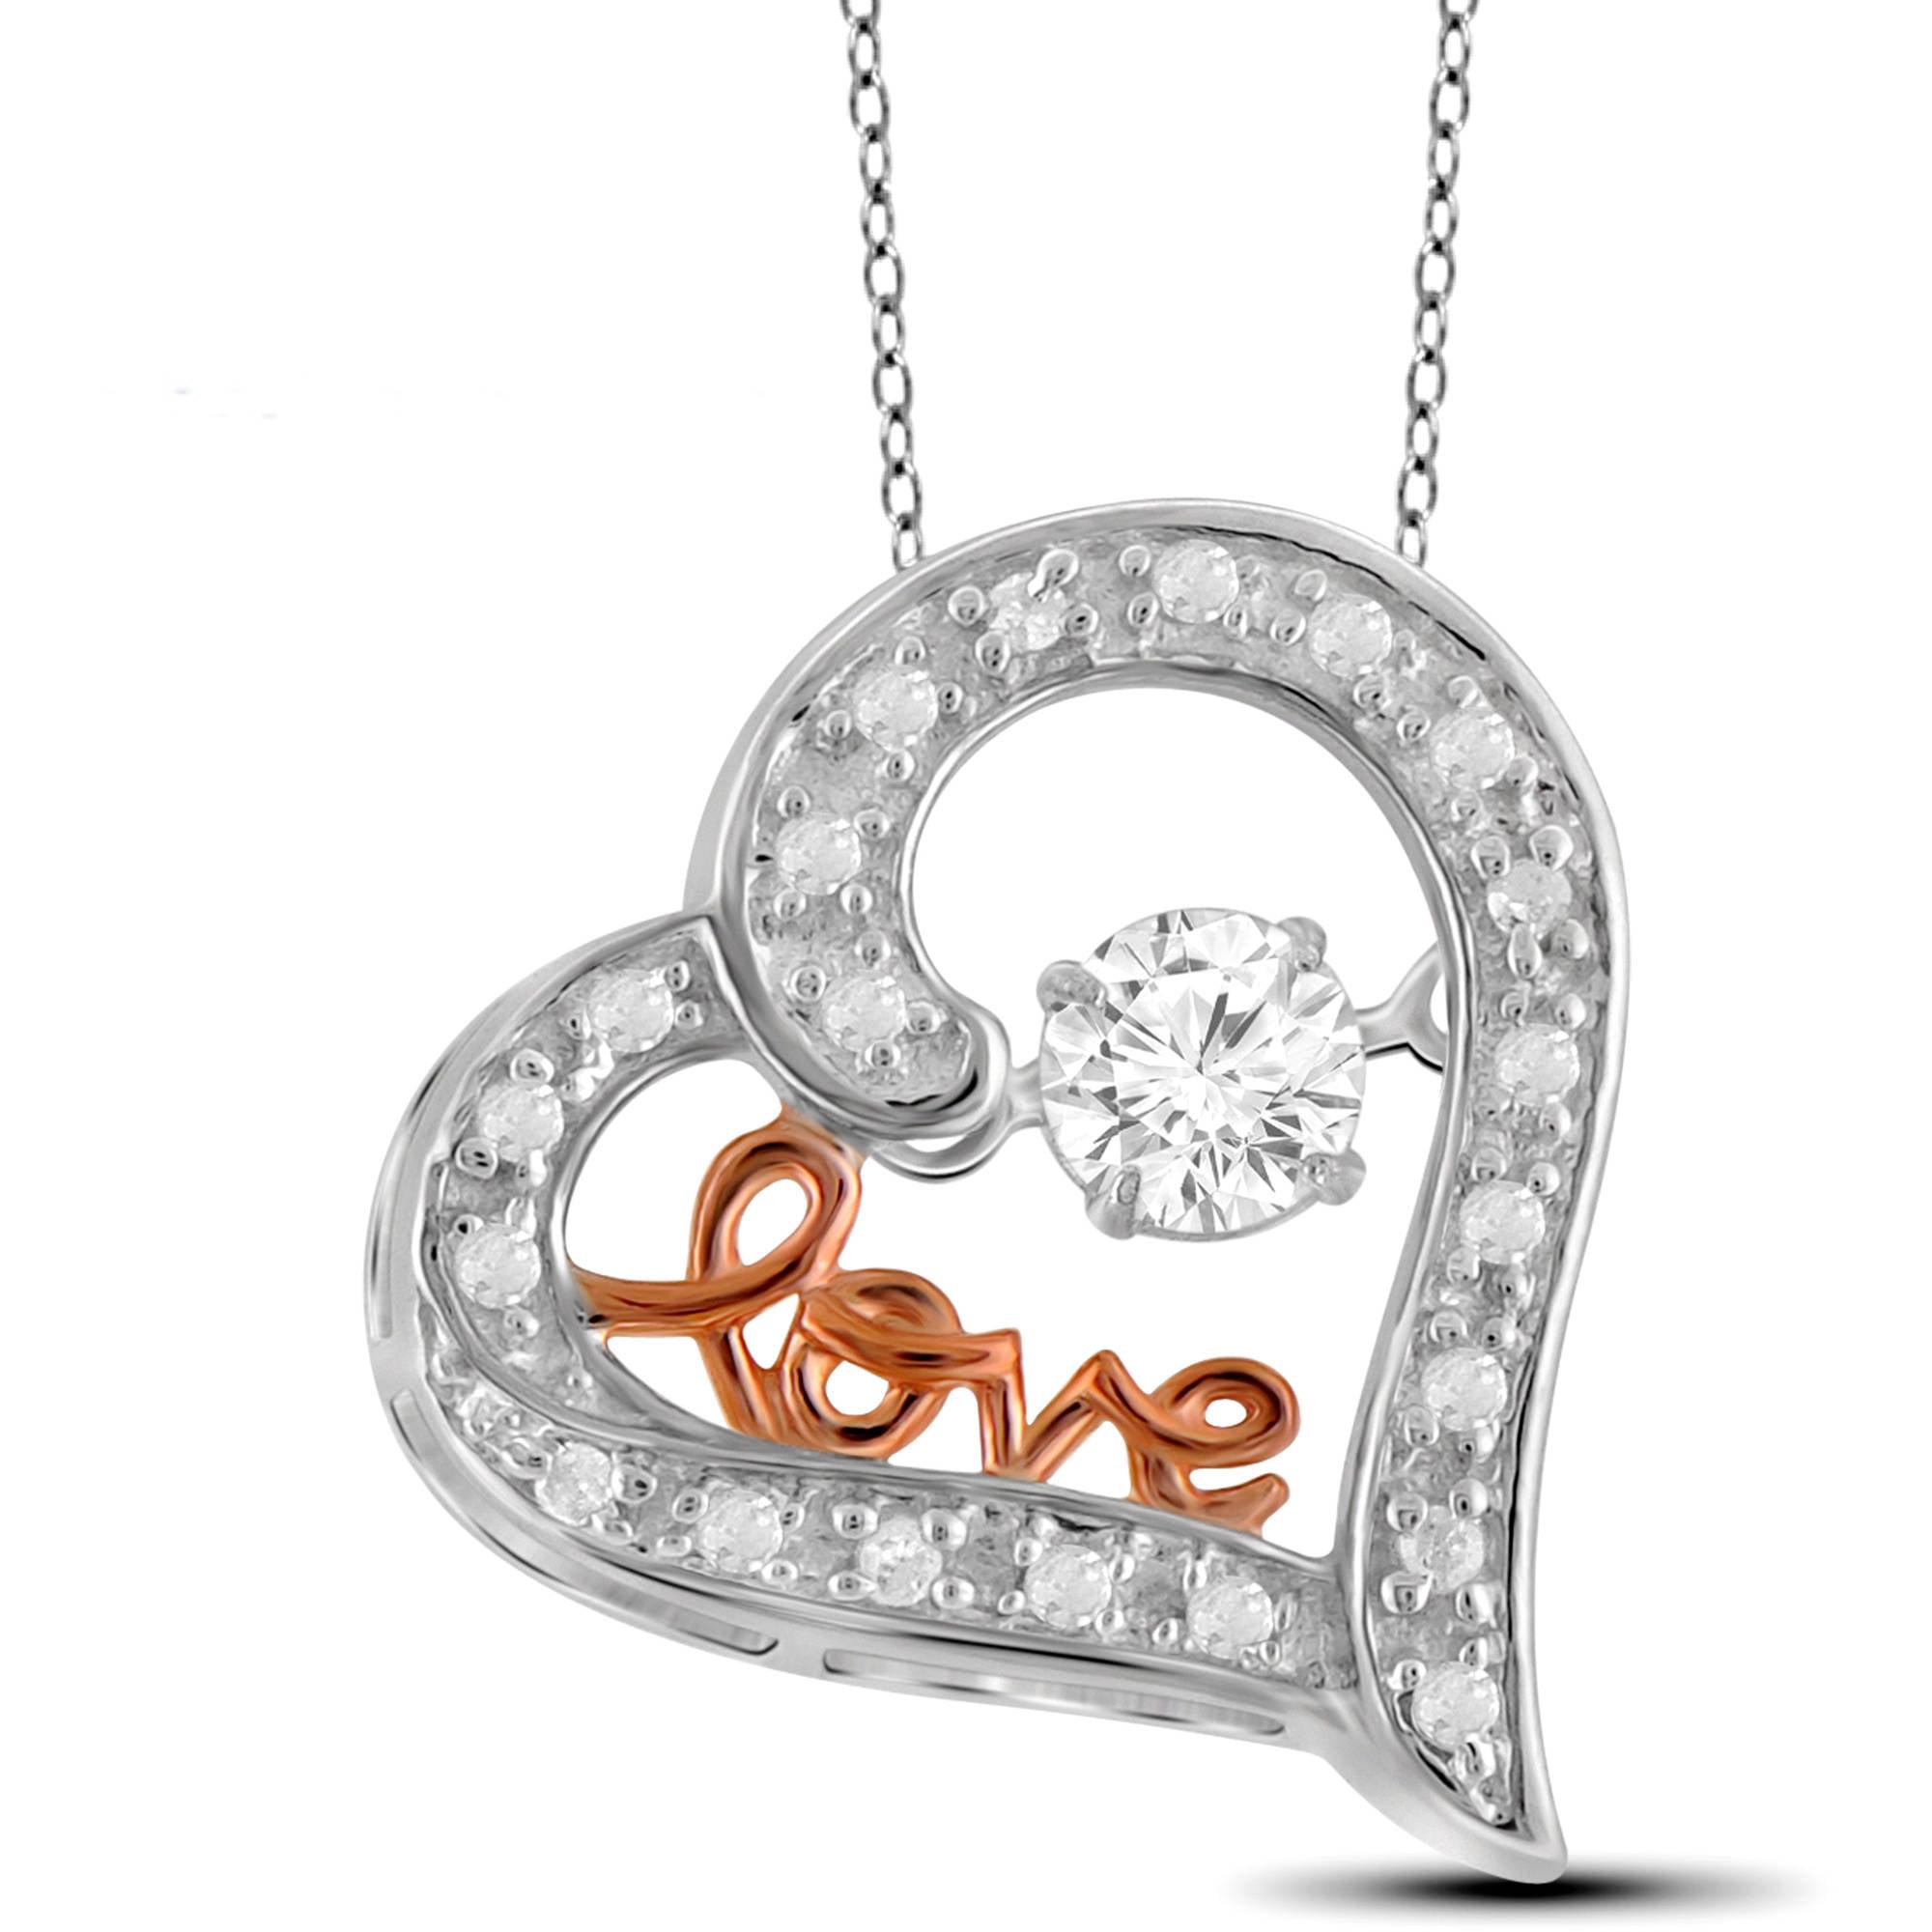 Diamonds in the Sky 1 5 Carat T.W. White Diamond 2-tone 10kt White Gold Love Heart Pendant by Diamonds in the Sky